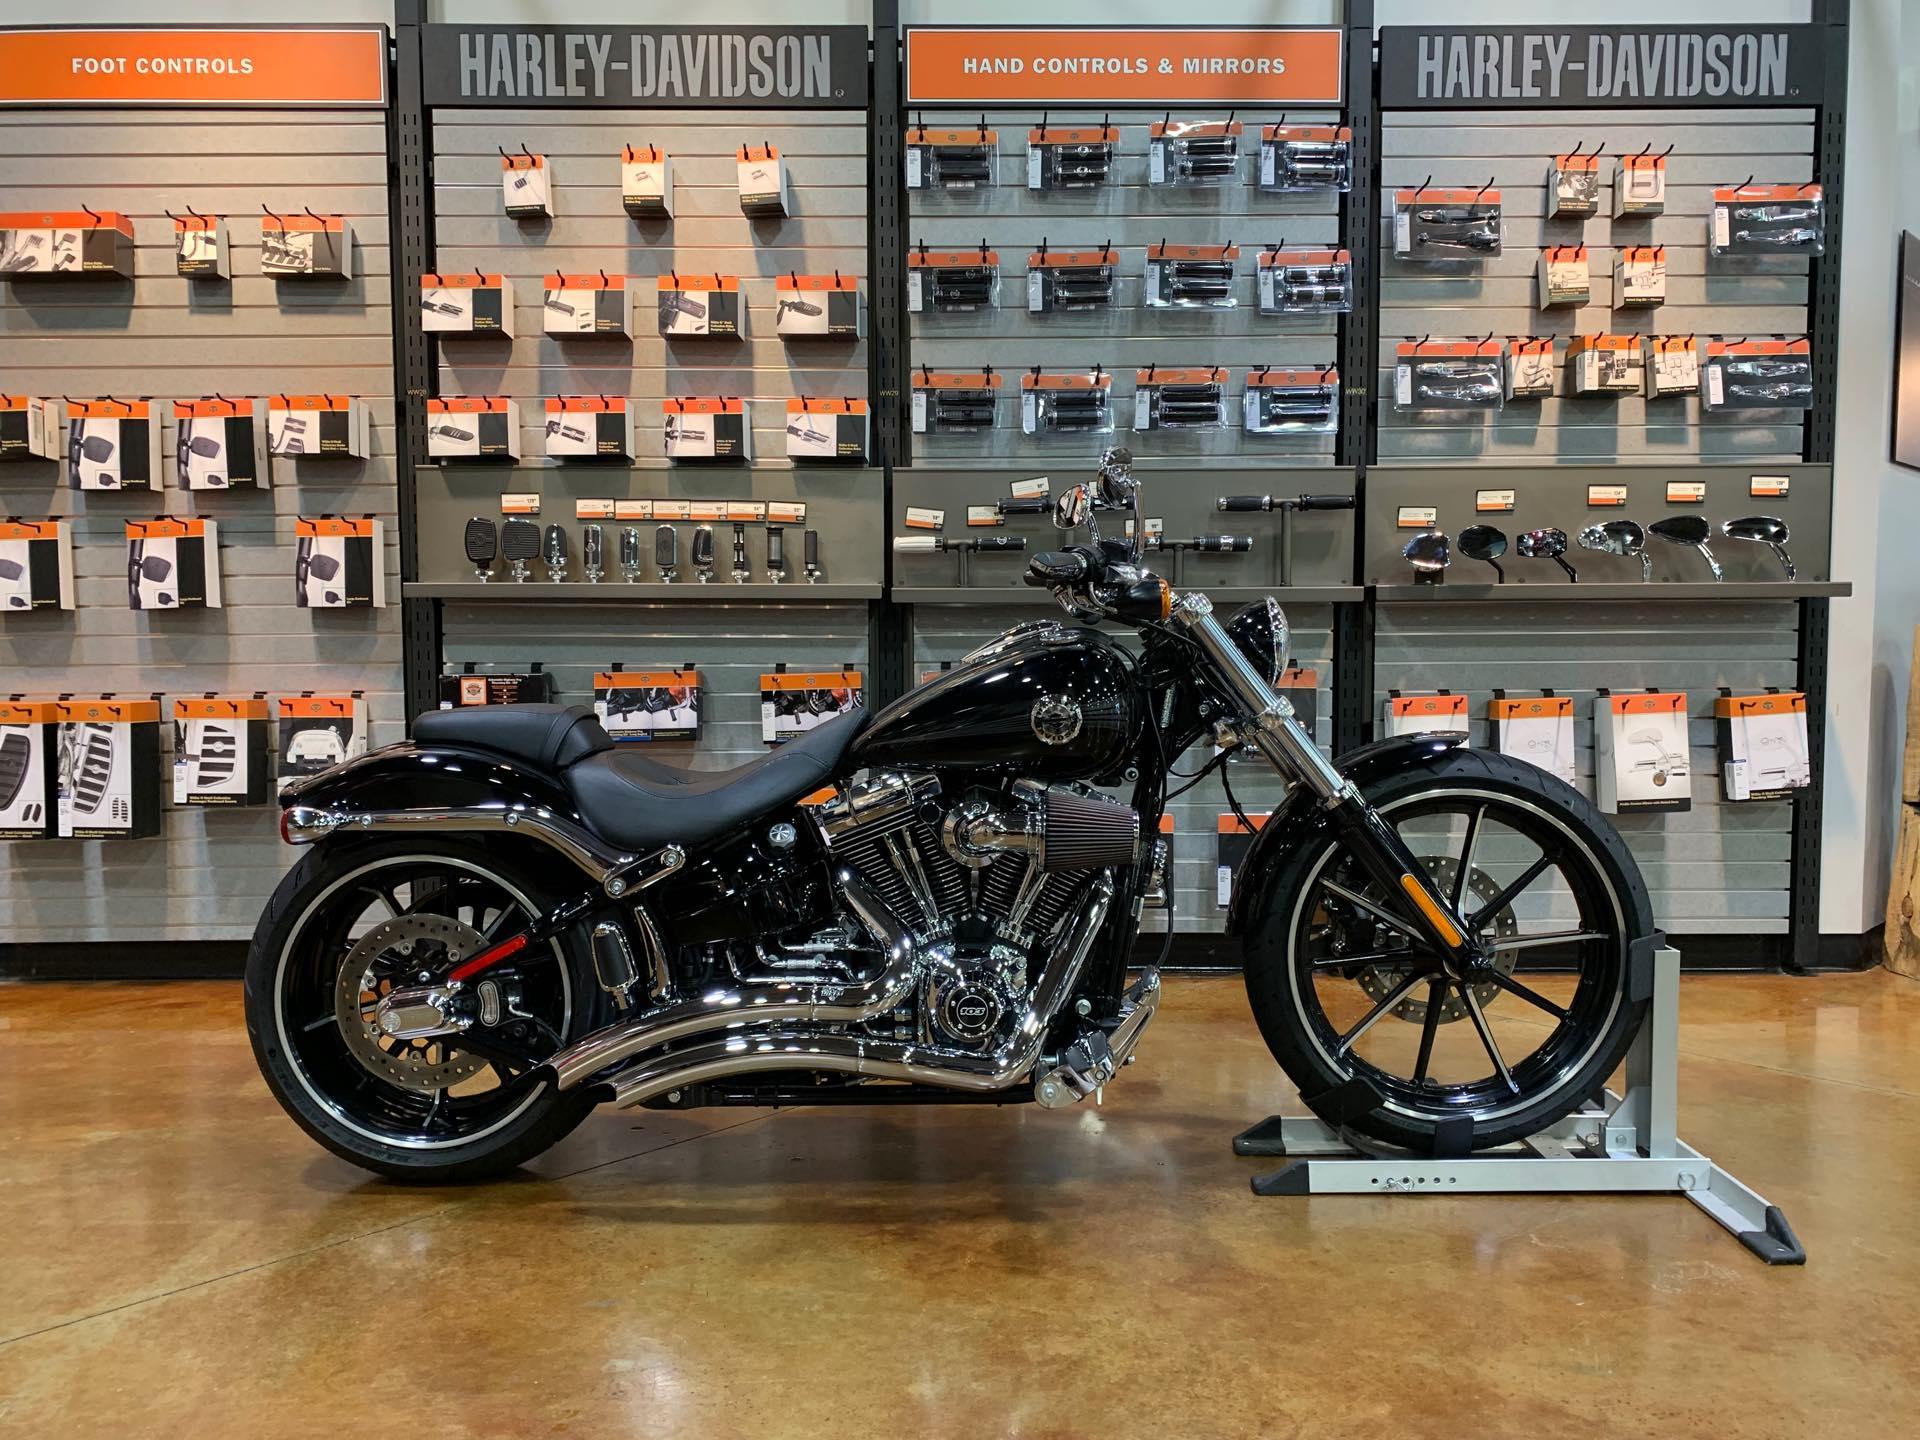 2015 Harley-Davidson Softail Breakout at Colonial Harley-Davidson